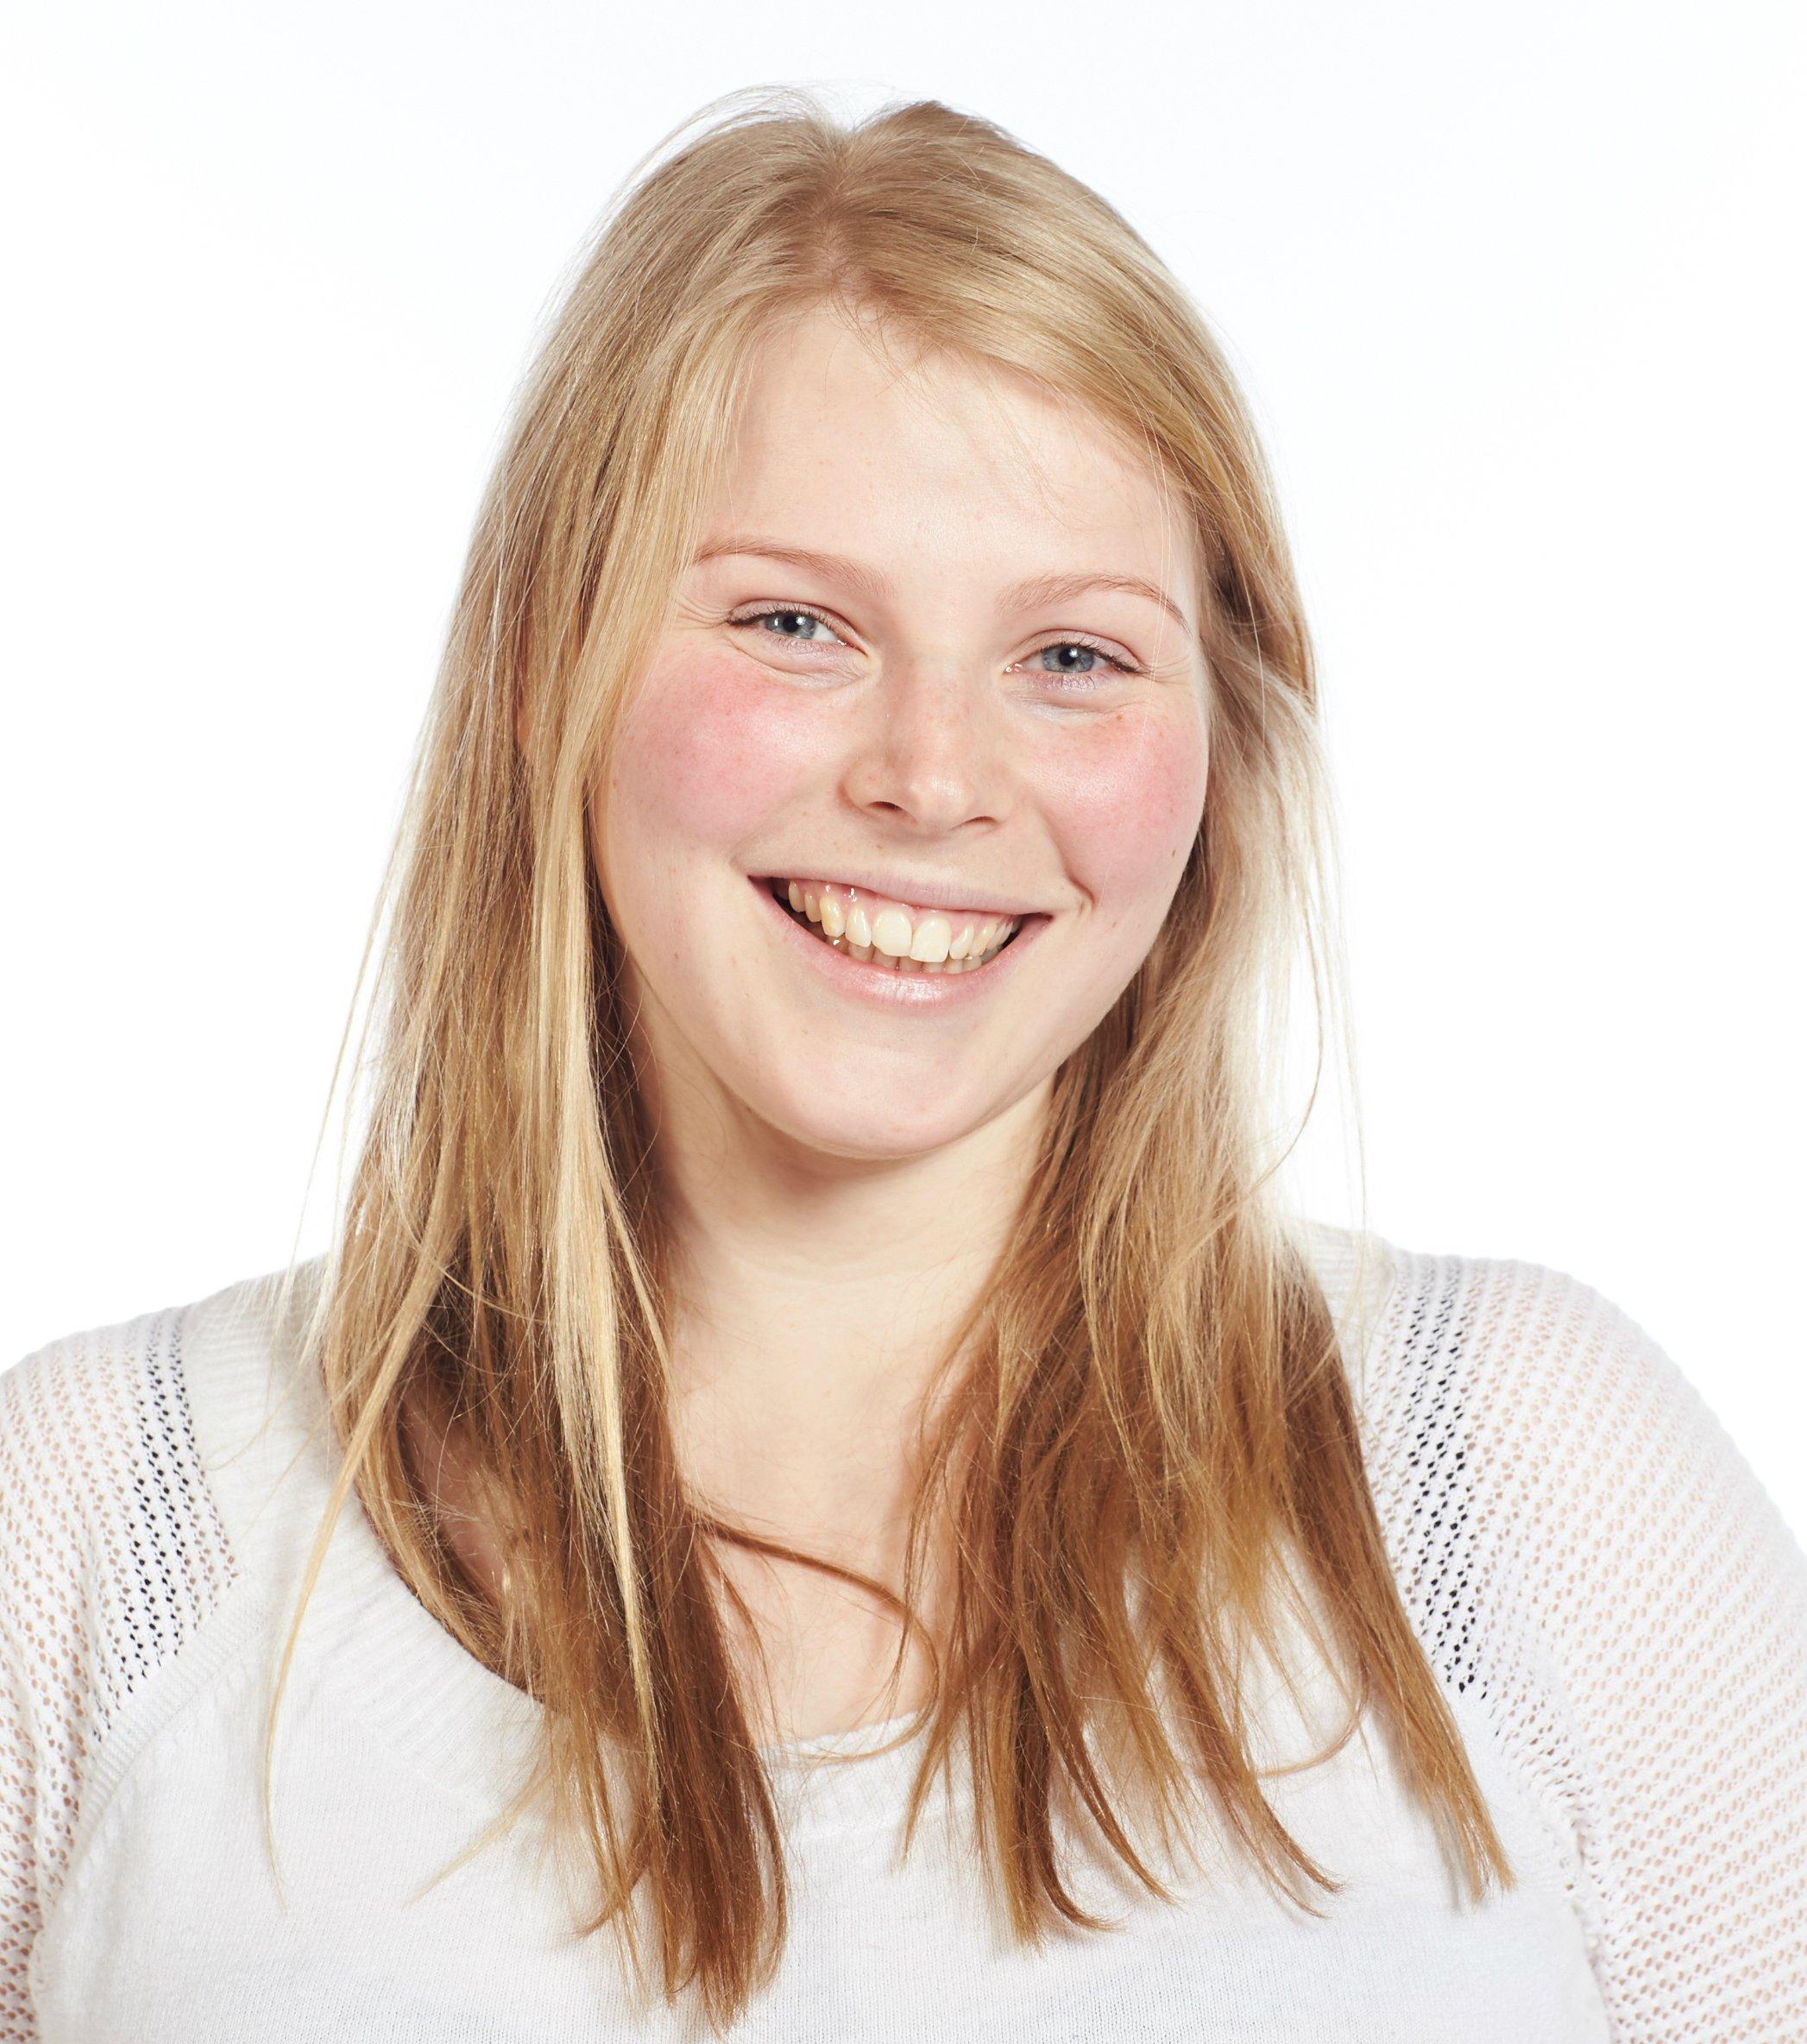 Catie Harrison